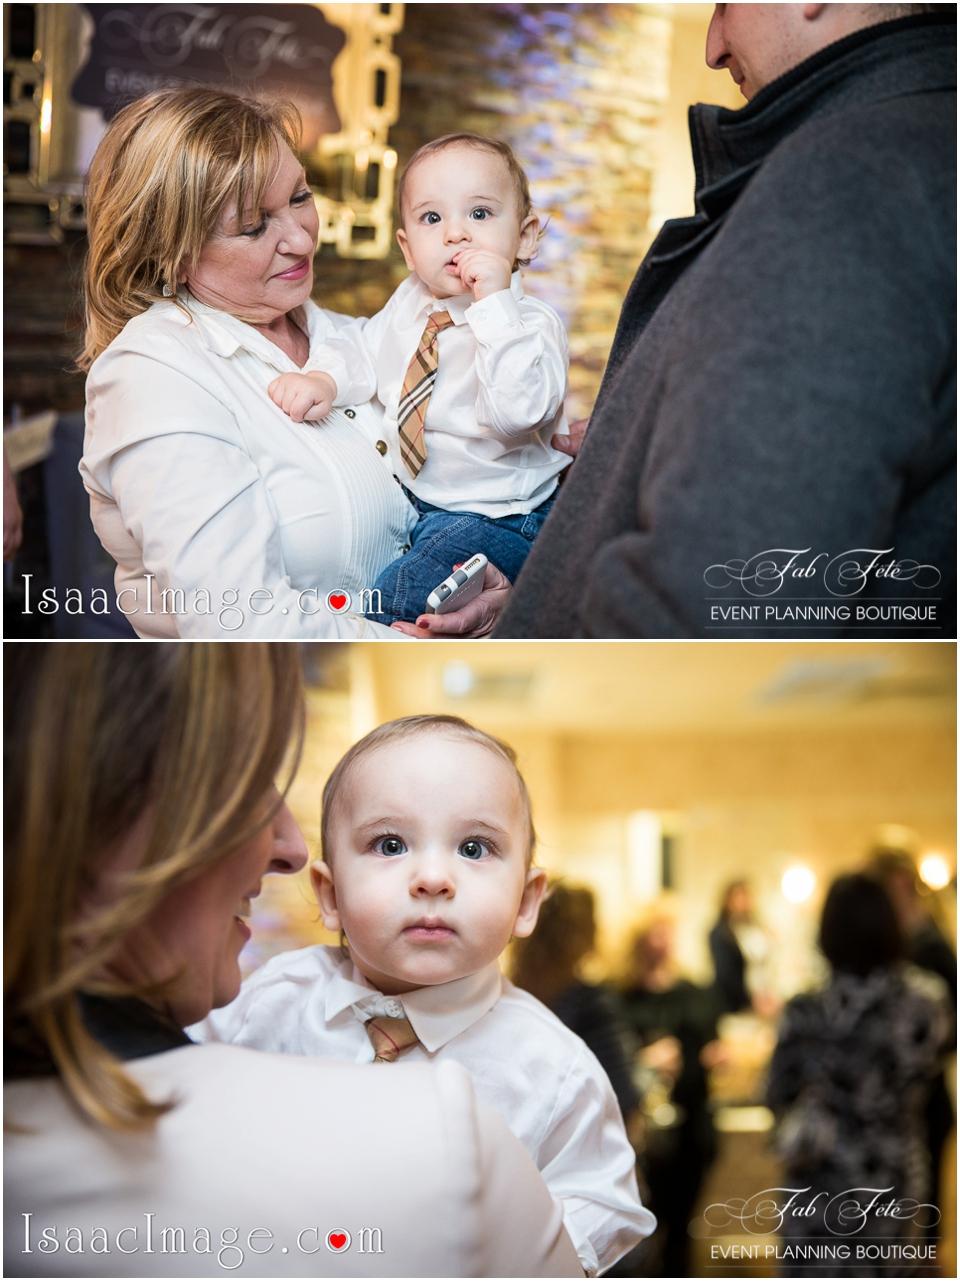 Fab Fete Toronto Wedding Event Planning Boutique open house_6478.jpg